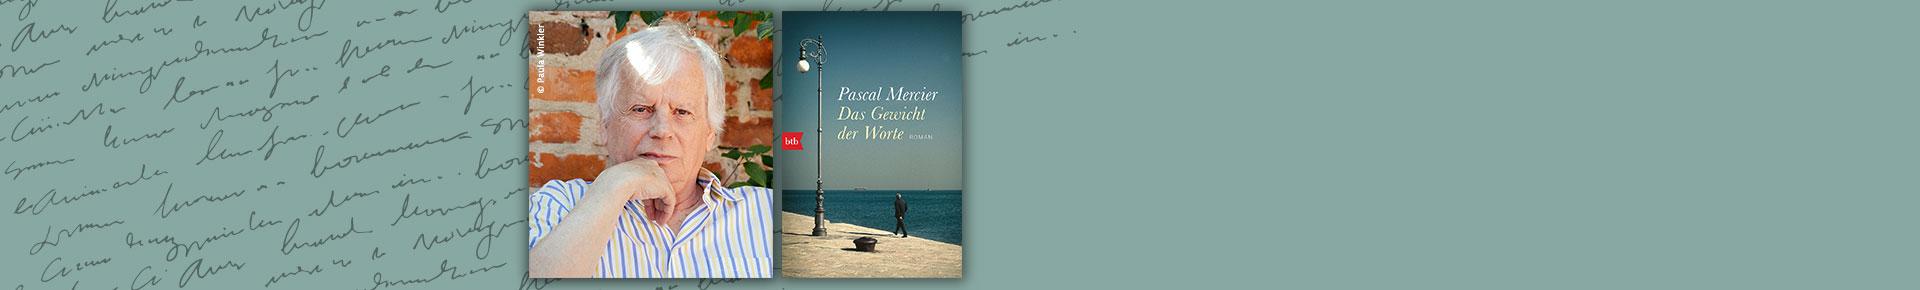 Lernen Sie Pascal Mercier, unseren Autor des Monats, kennen.